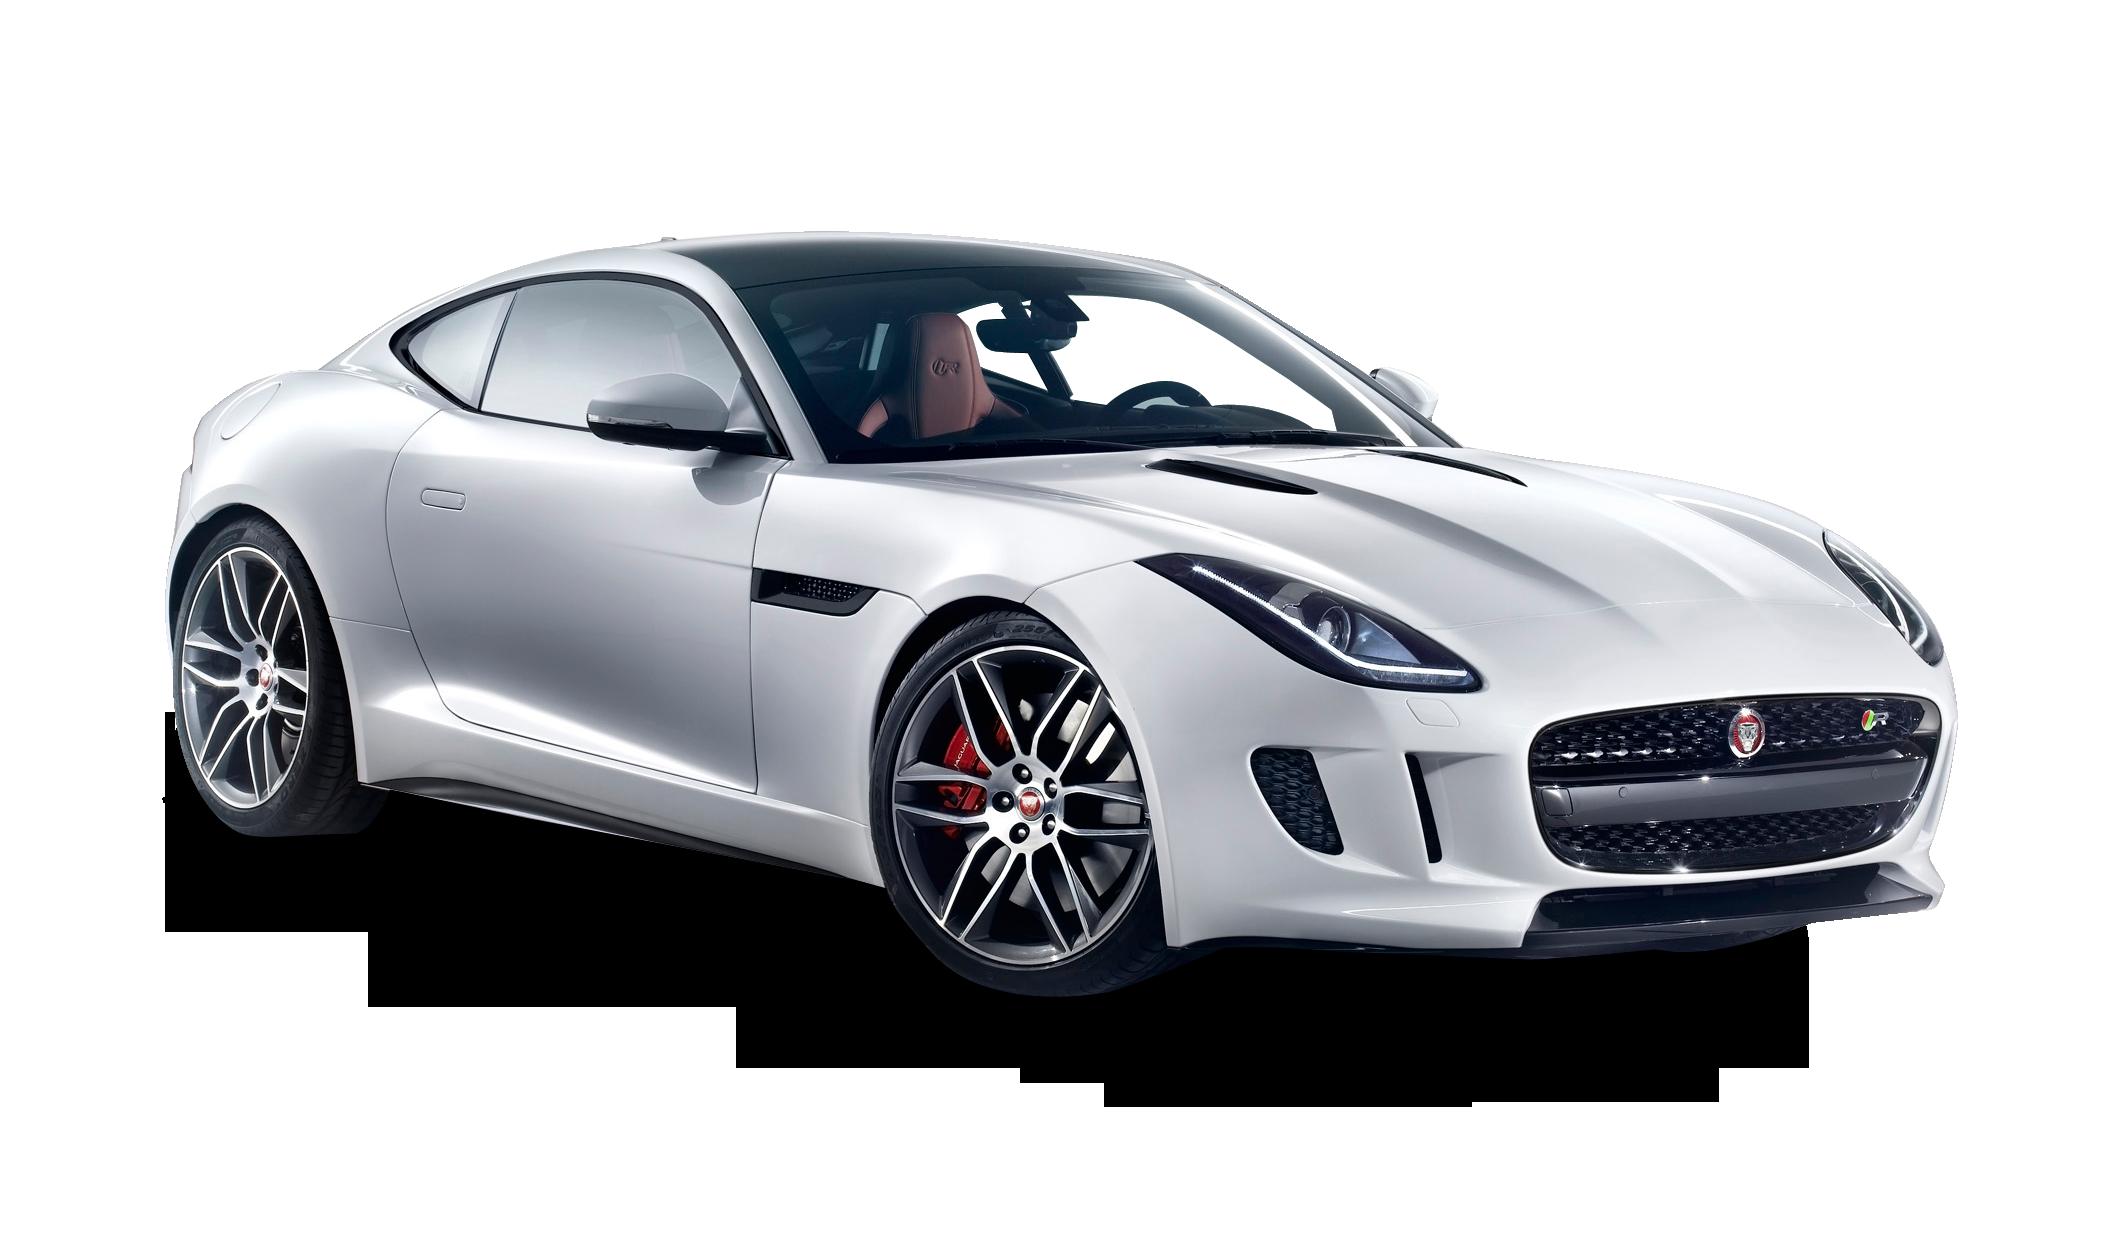 Jaguar car clipart png free download Jaguar F TYPE Car PNG Image - PurePNG | Free transparent CC0 PNG ... png free download